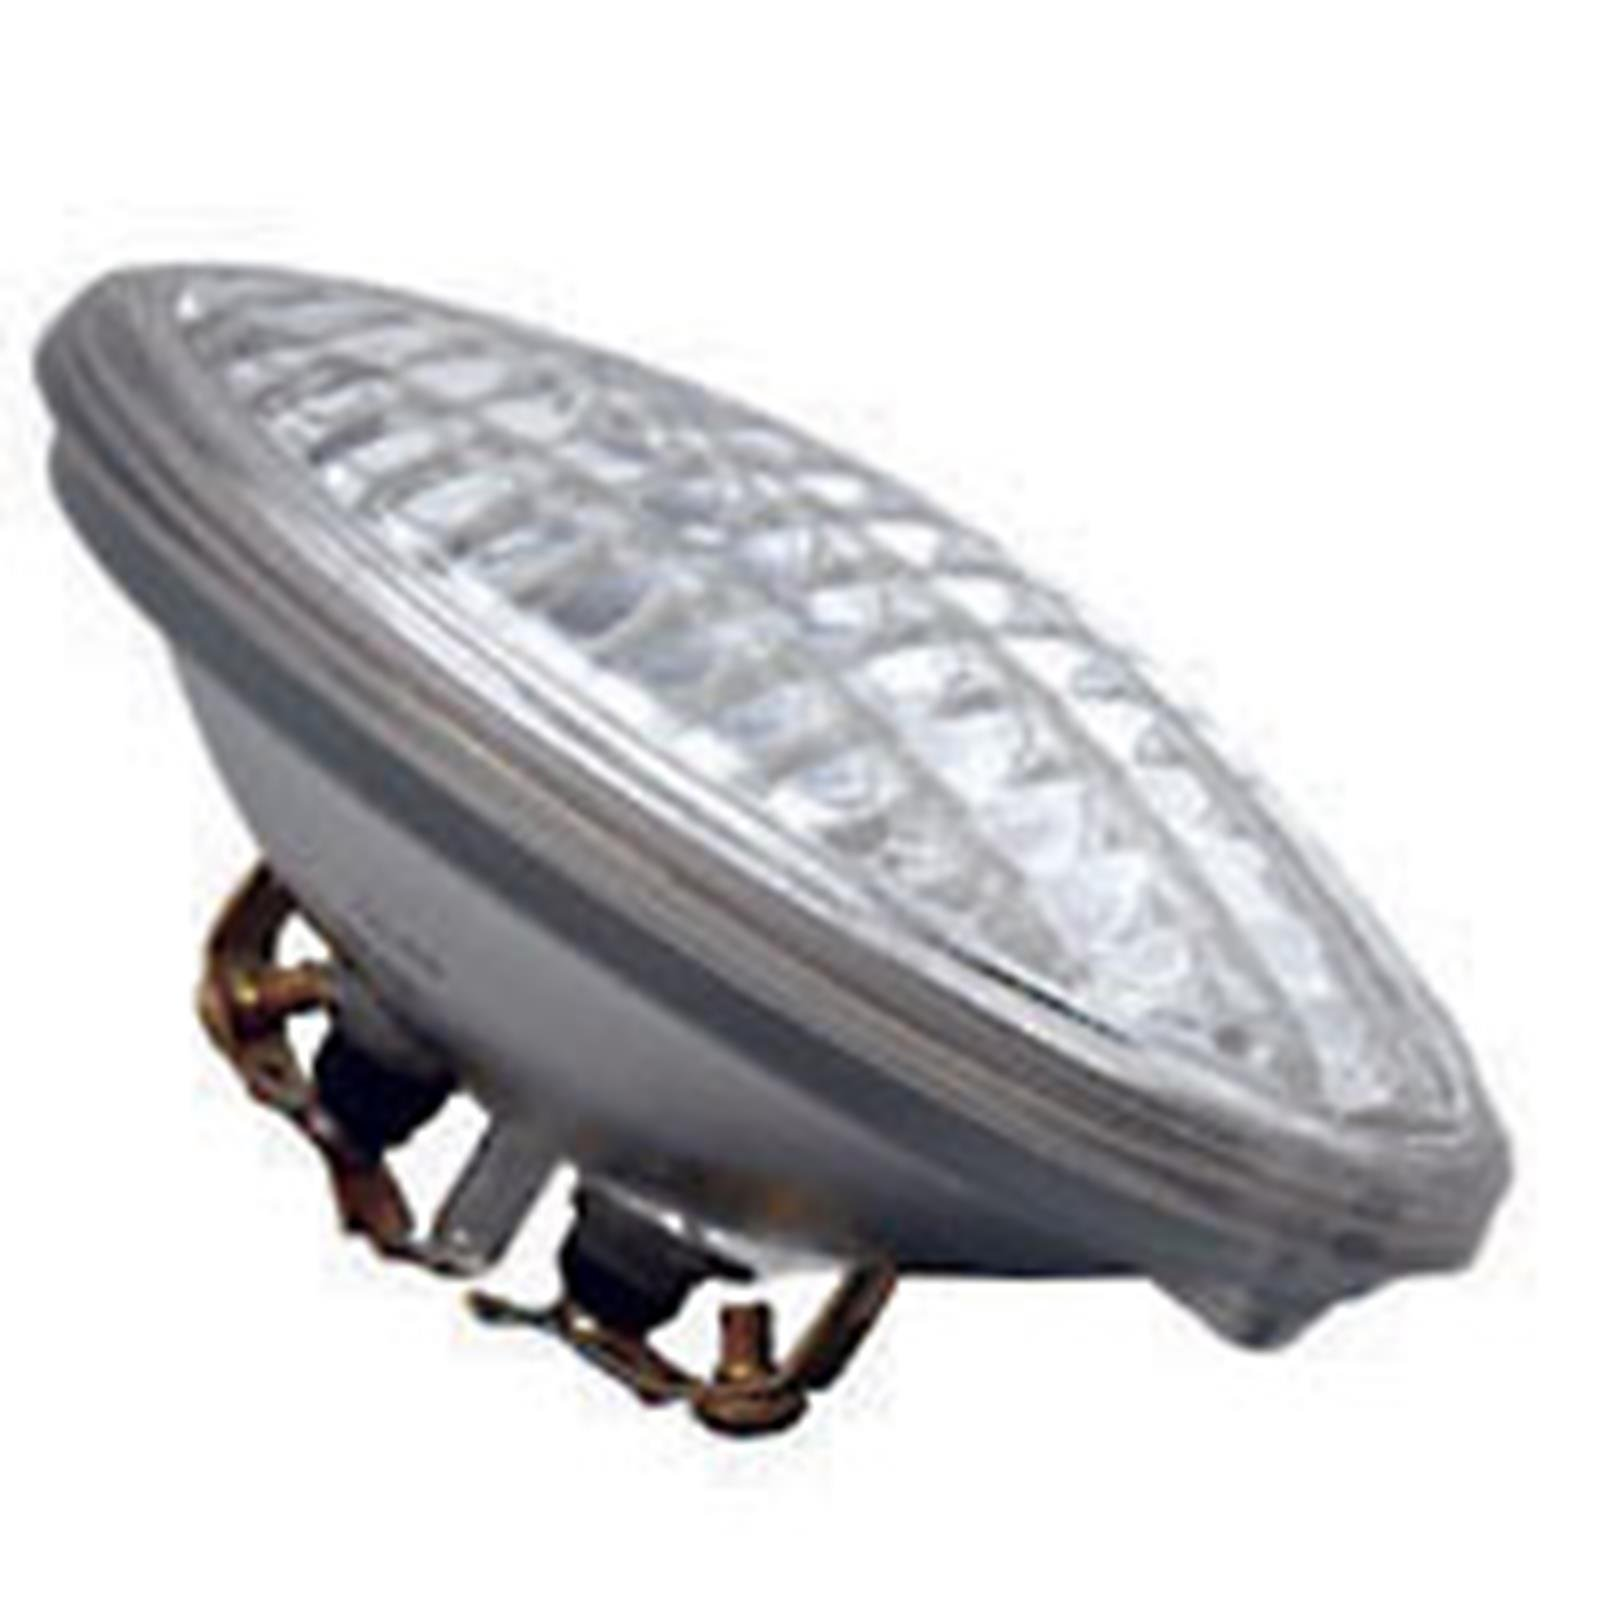 12 Qty. Halco 20W PAR36 VNSP 12V MP-TERM HaloXen HP36VNSP20/HX 20w 12v Halogen Very Narrow Spot HaloXen Lamp Bulb